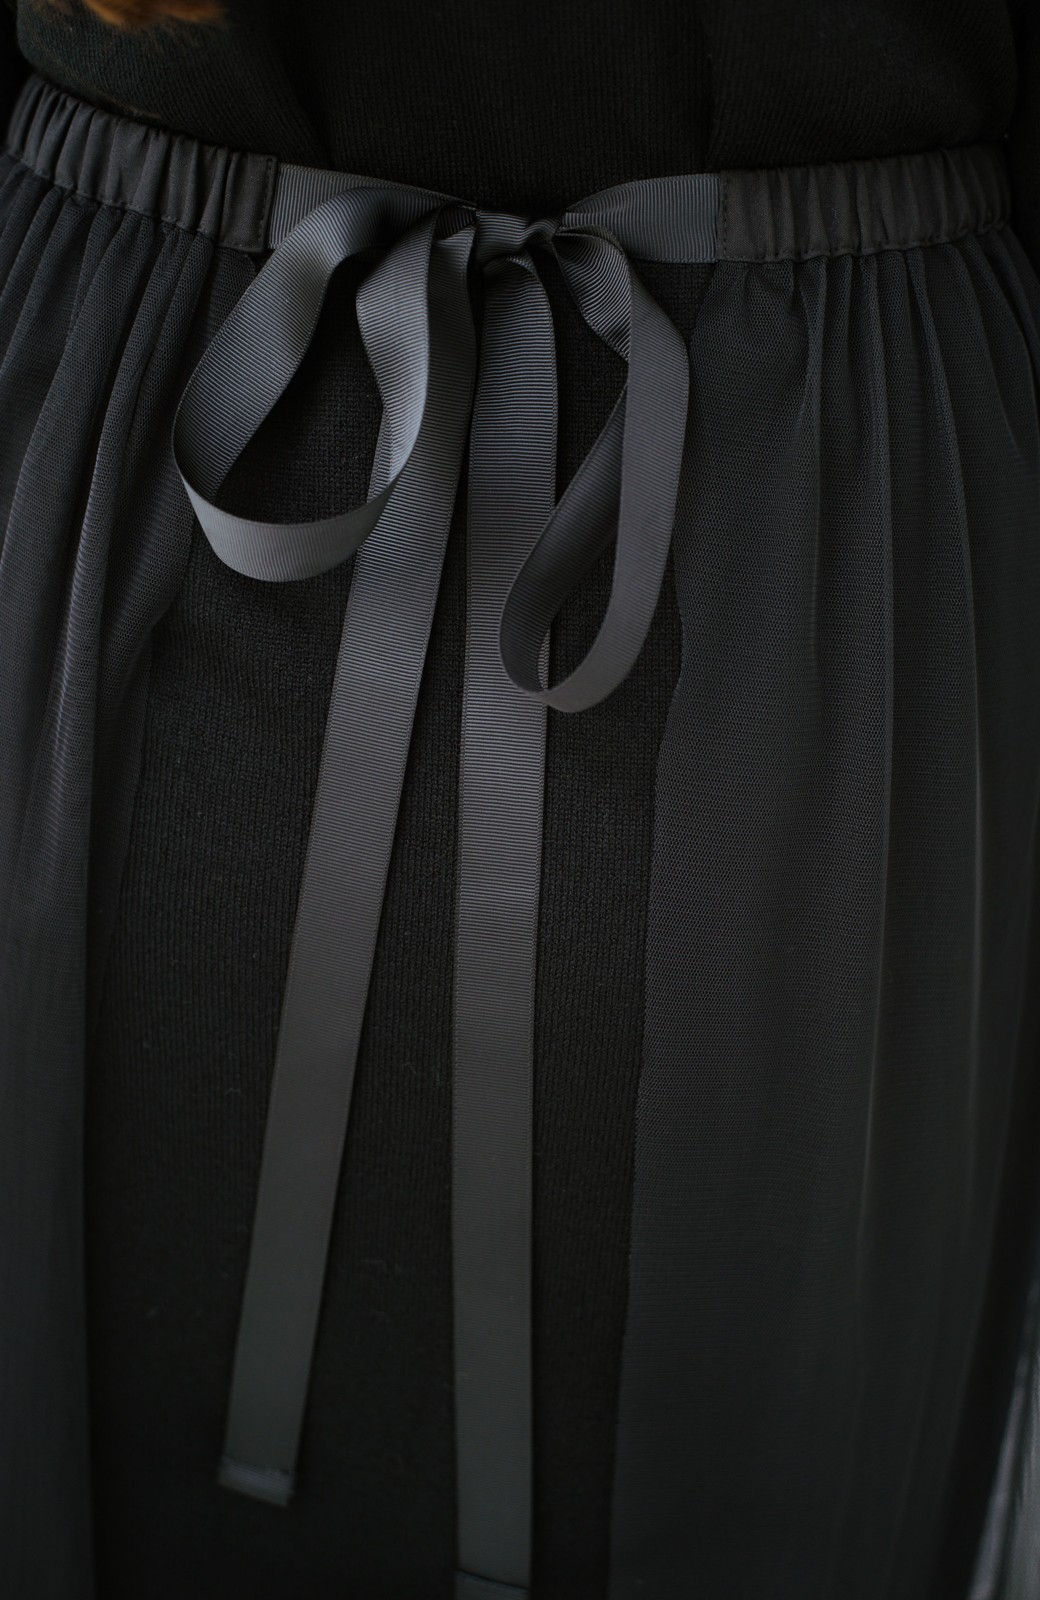 haco! 着こなし無限!自由自在なスリットロングニットとチェックプリーツスカートとチュール巻きスカートの3点セット <ブラック>の商品写真13